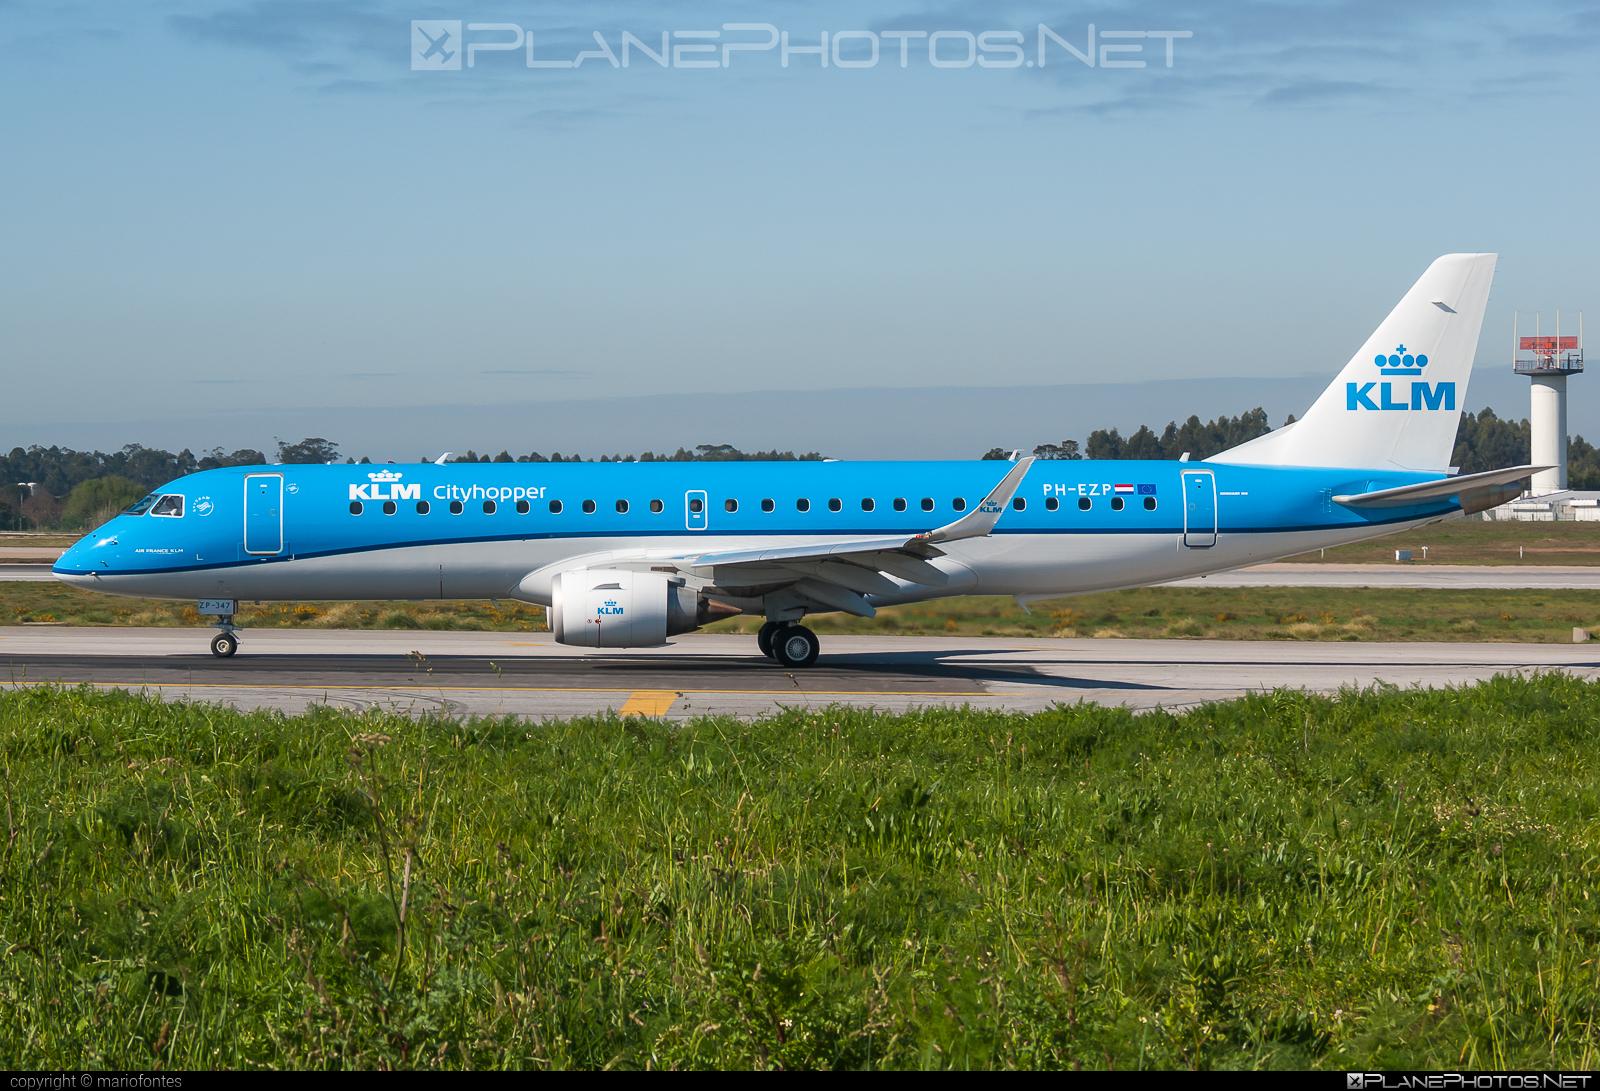 Embraer E190STD (ERJ-190-100STD) - PH-EZP operated by KLM Cityhopper #e190 #e190100 #e190100std #e190std #embraer #embraer190 #embraer190100std #embraer190std #klm #klmcityhopper